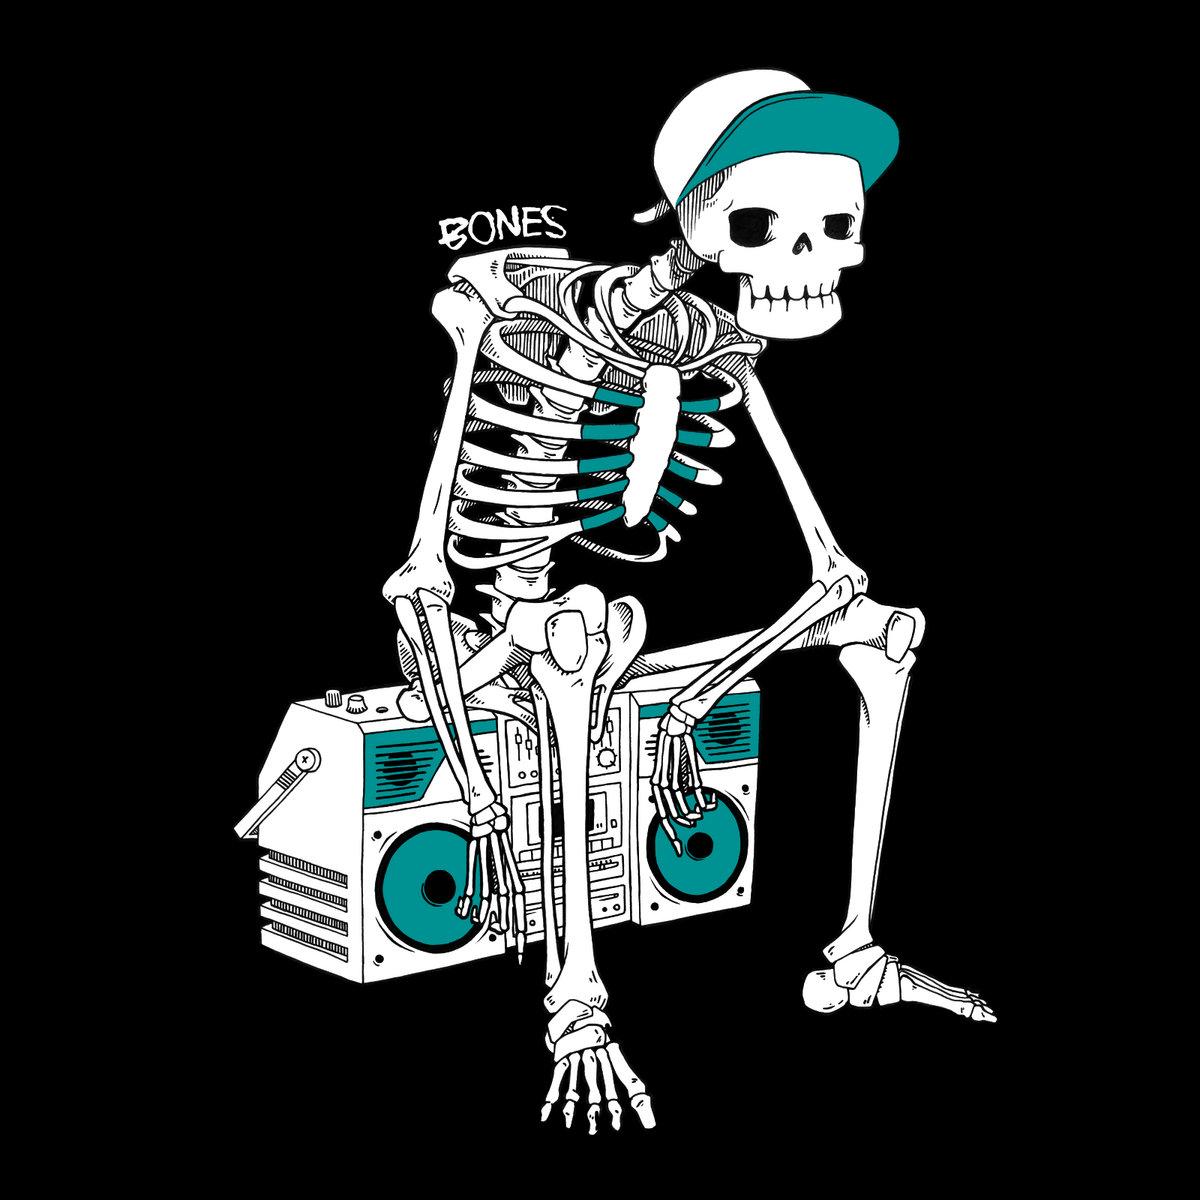 Kno - Bones (2016)